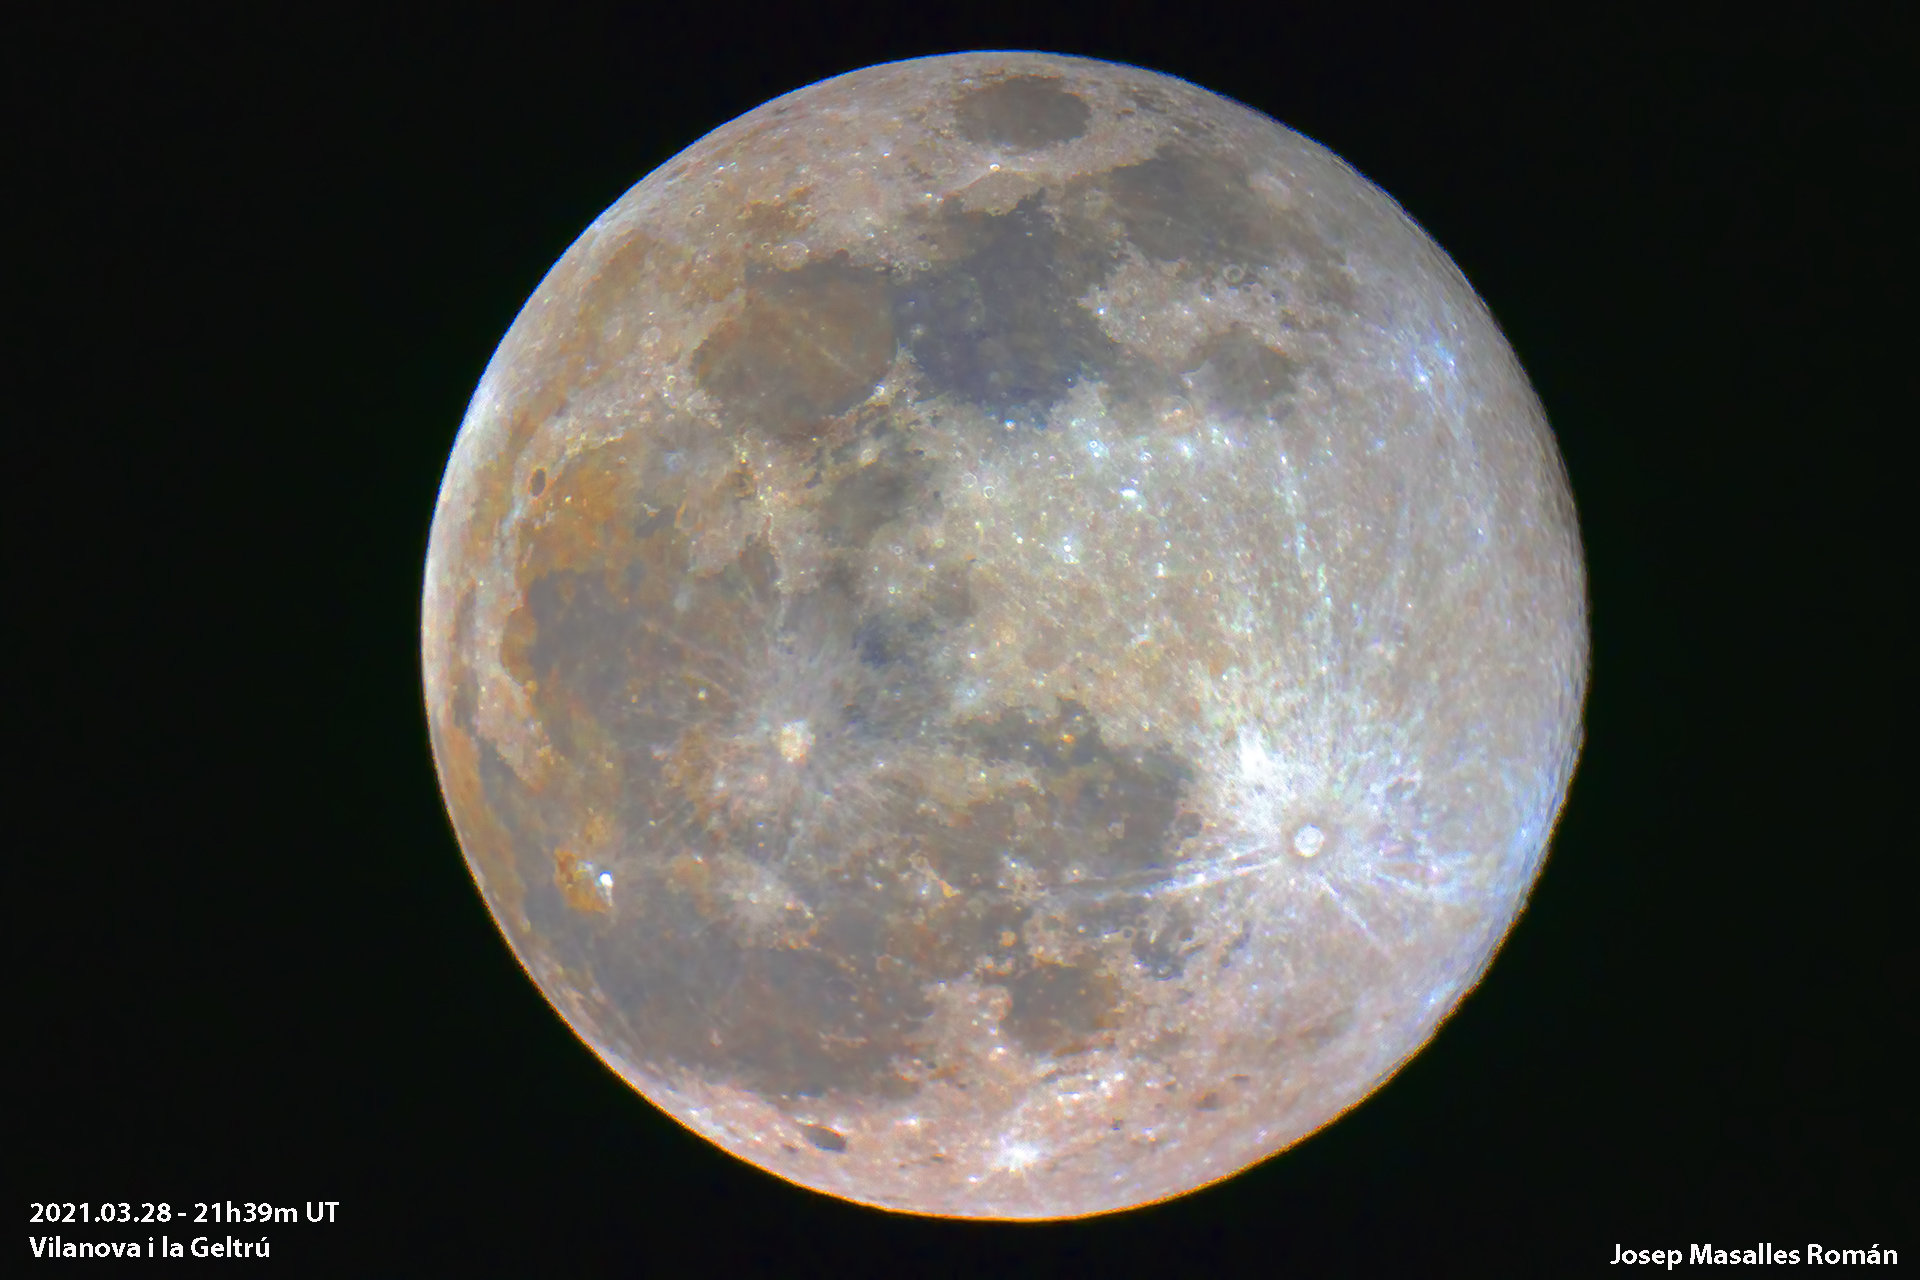 Lluna - Josep Massalles